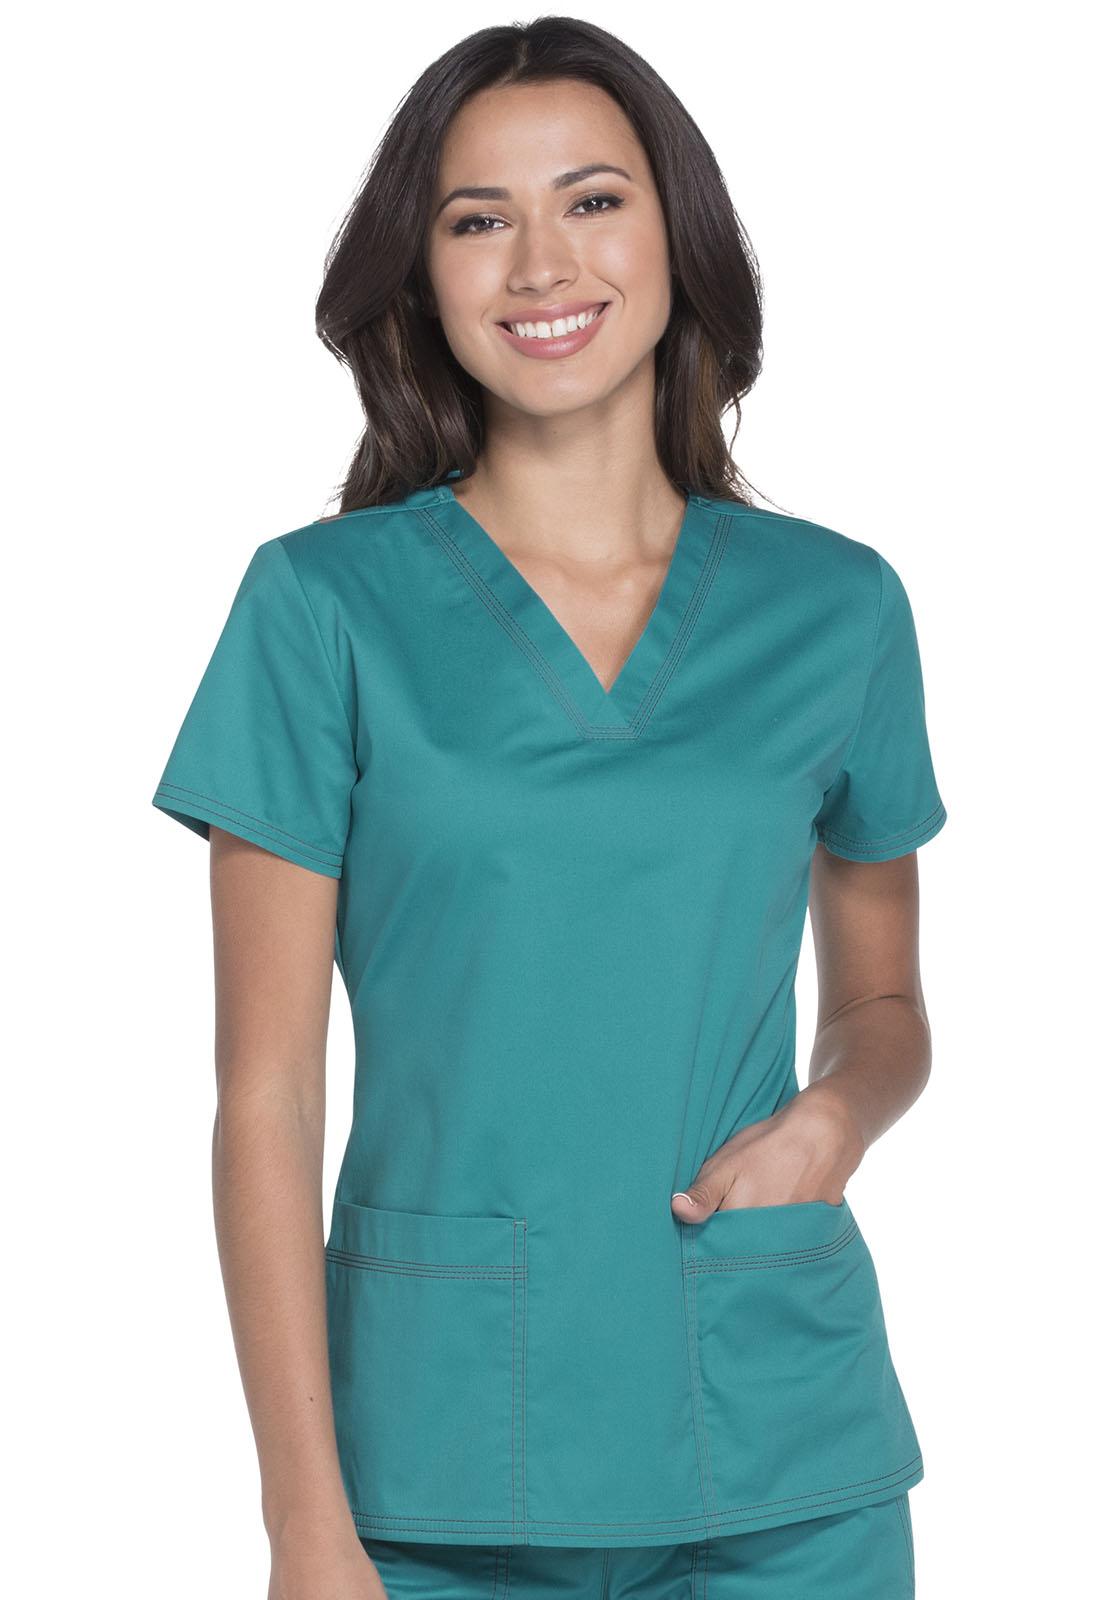 Najlepsze miejsce kupuj bestsellery innowacyjny design Dickies V-Neck Top (Regular) in Teal from Dickies Medical